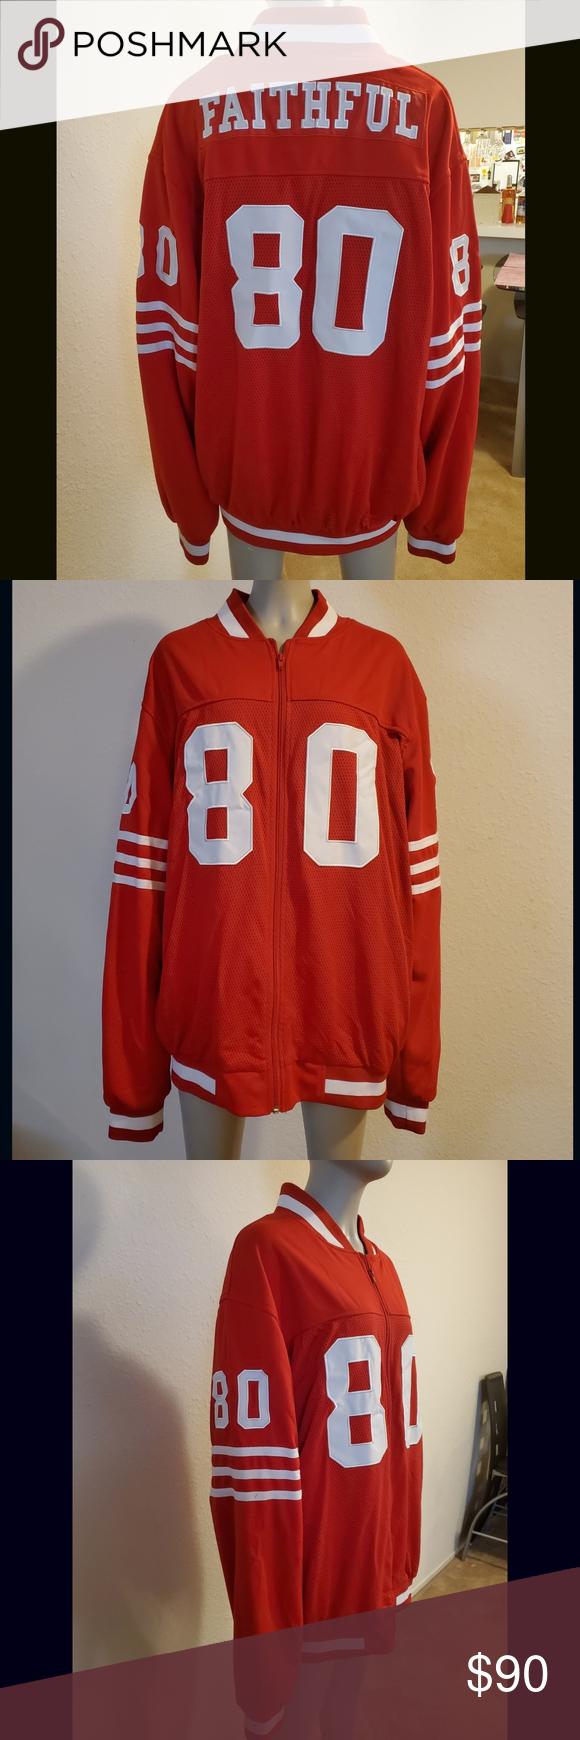 San Francisco 49ers Faithful Jersey Jacket Jersey jacket